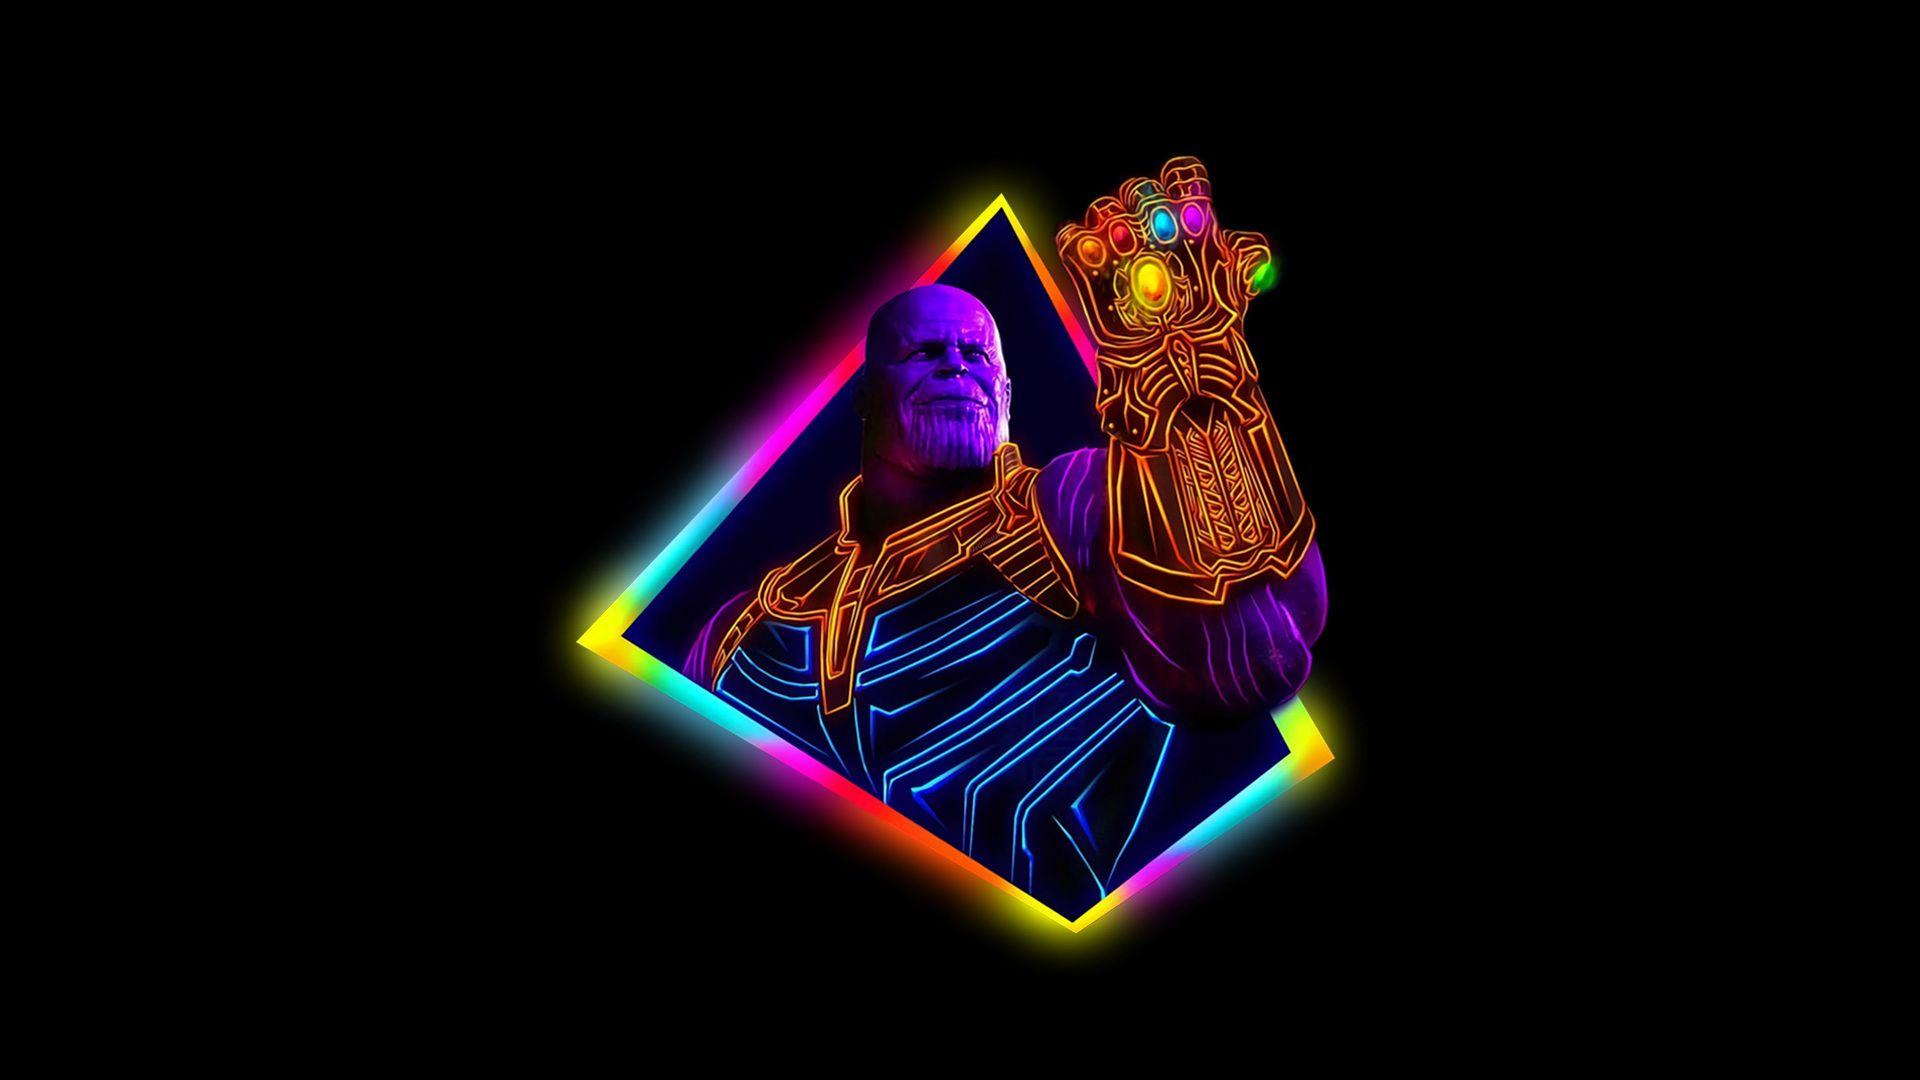 1920x1080 Thanos Avengers Infinity War 80s Style Artwork Avengers Thanos Neon 80s Infinity Wallpapers War 4k D In 2020 Neon Art Avengers Wallpaper Neon Wallpaper